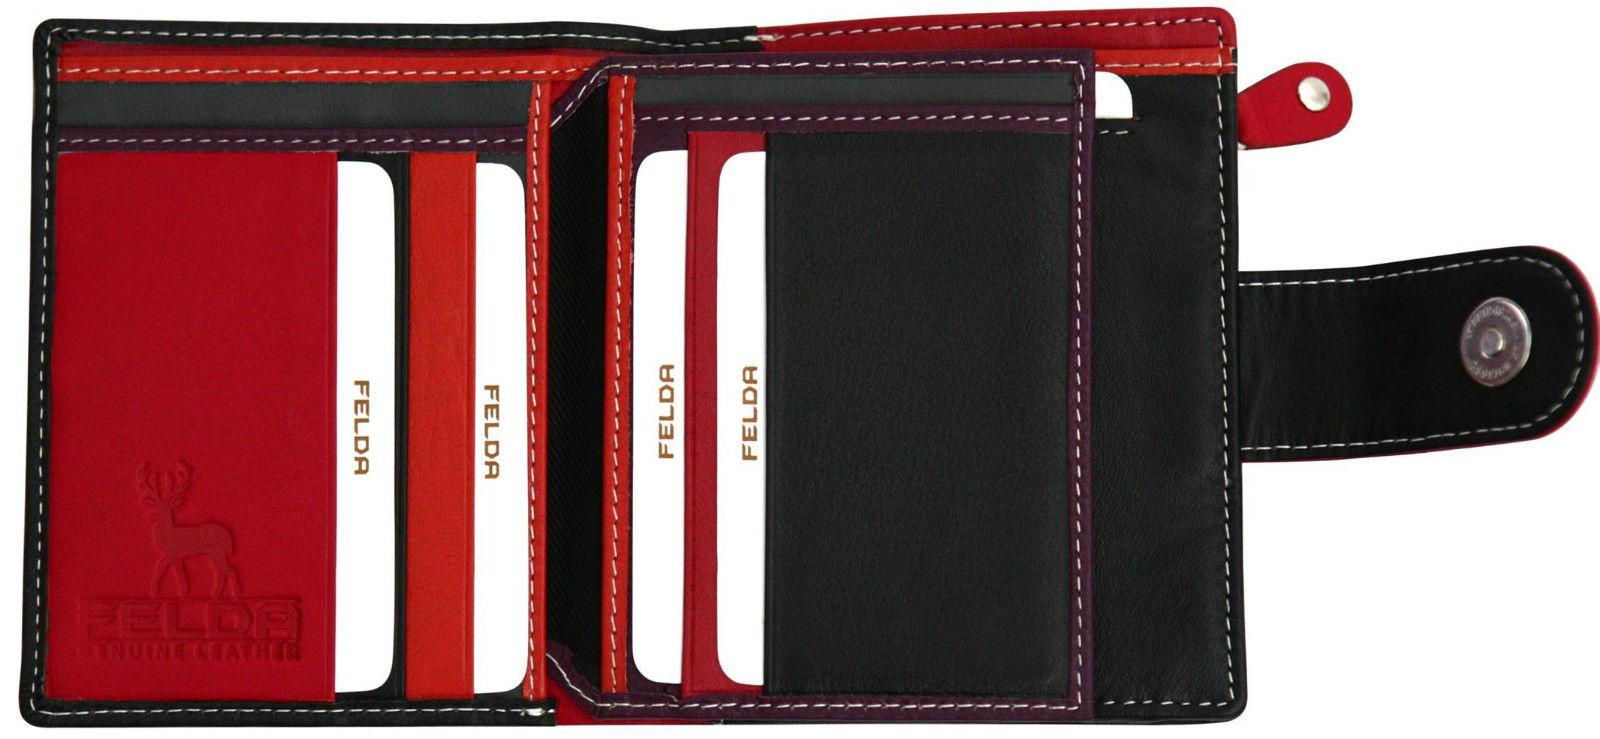 Felda-RFID-onorevoli-MEDAGLIA-amp-Card-Purse-Wallet-Genuine-Leather-Multi-SOFT-BOX-REGALO miniatura 20